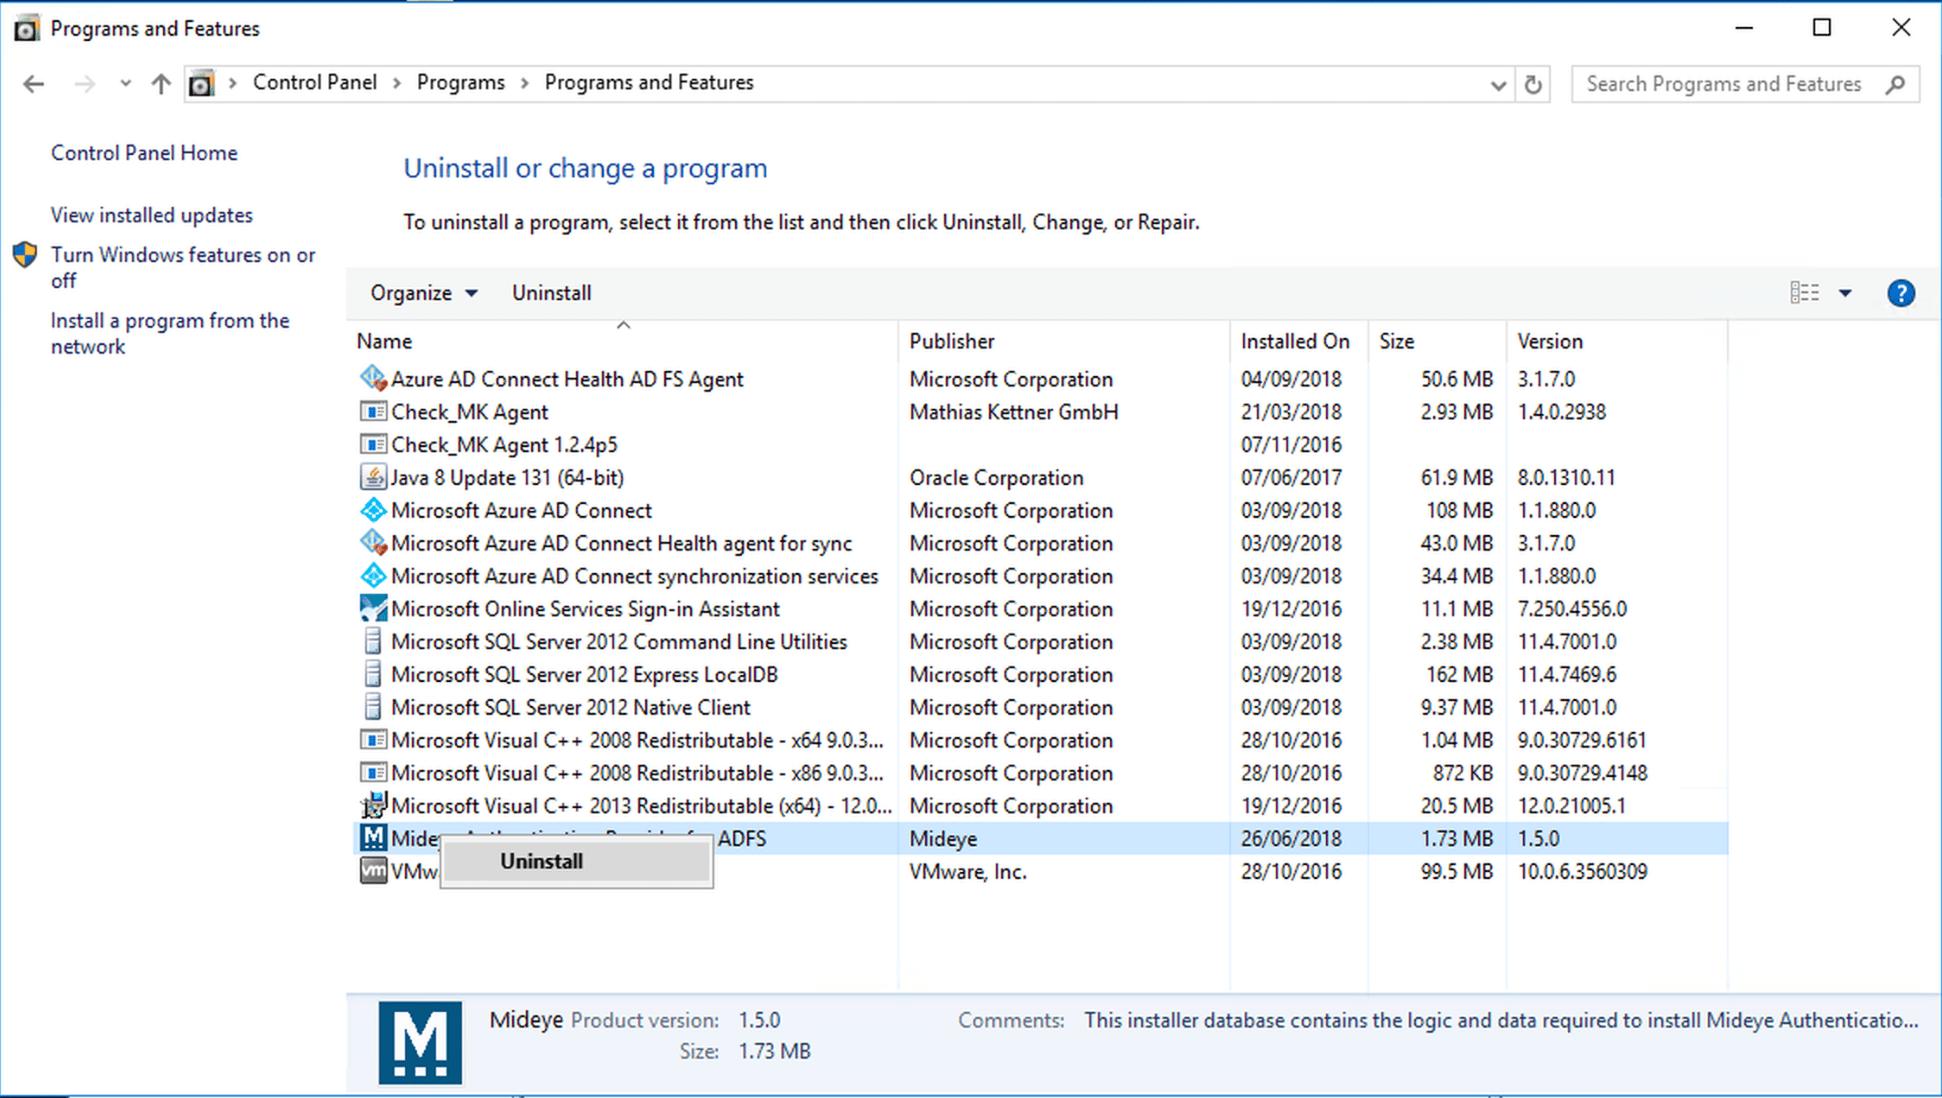 Open Control Panel and navigate Remove/Add programs. Uninstall the Mideye ADFS module